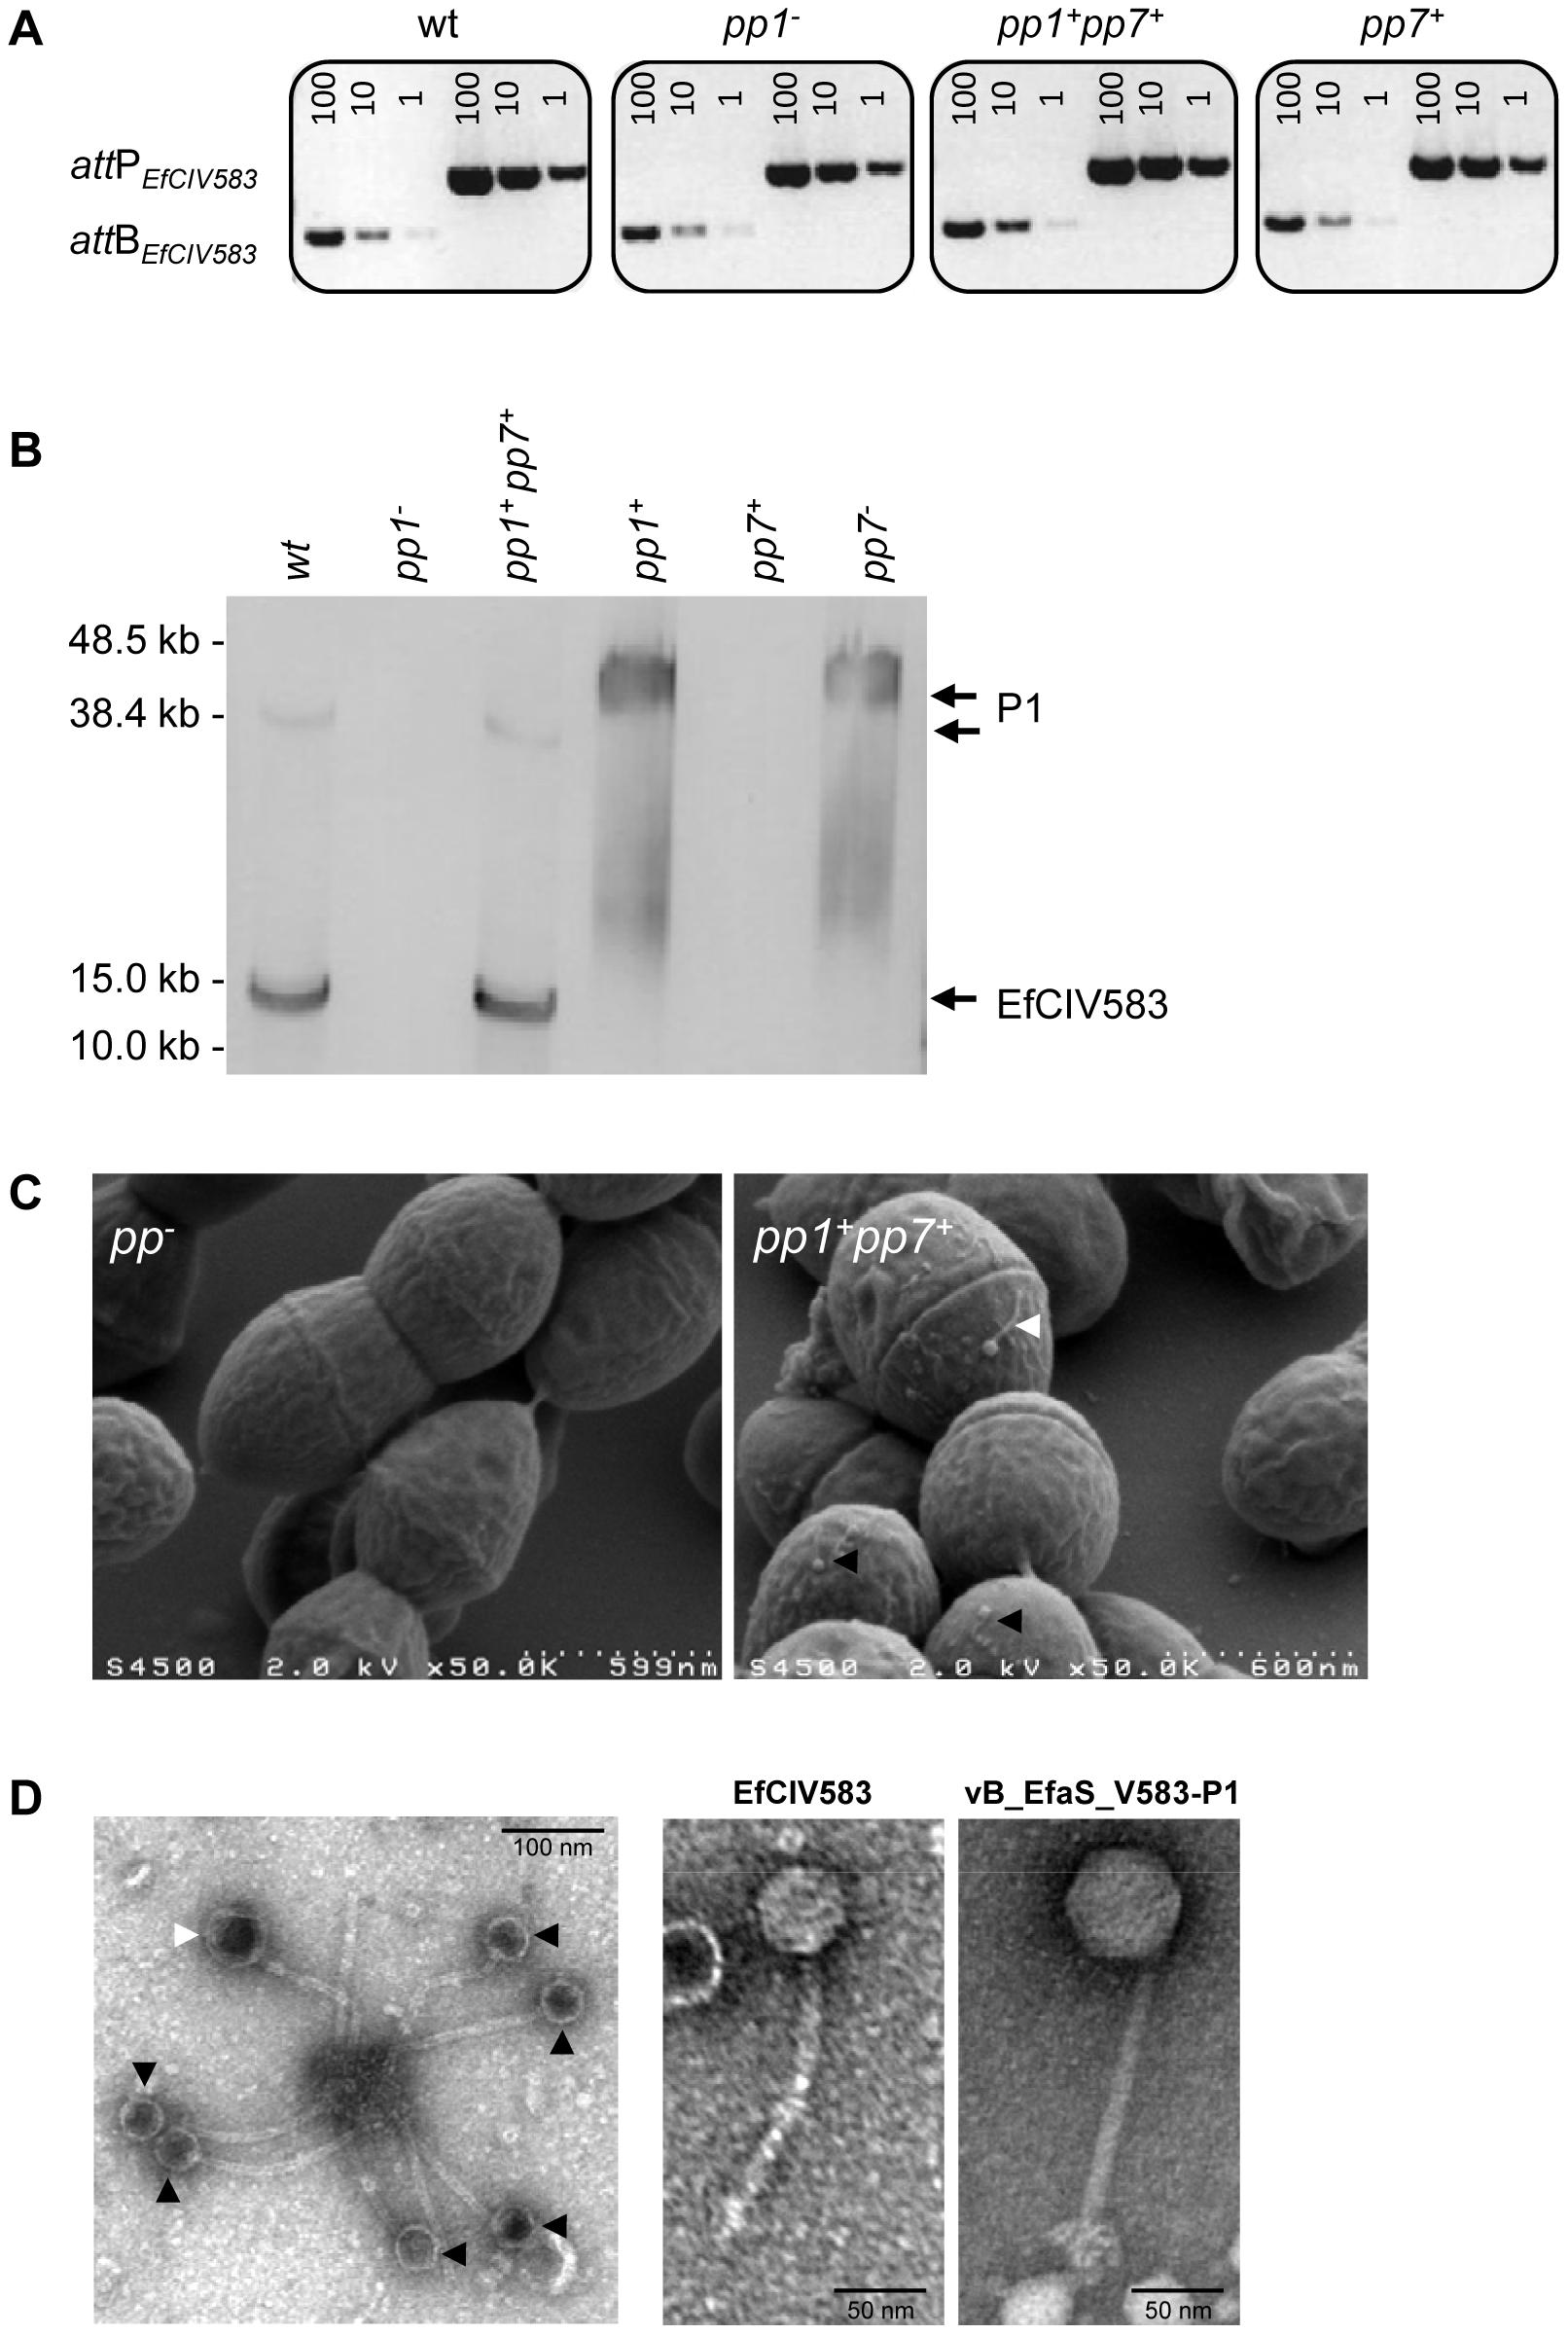 Interaction between <i>E. faecalis</i> pp1 and pp7 (EfCIV583).